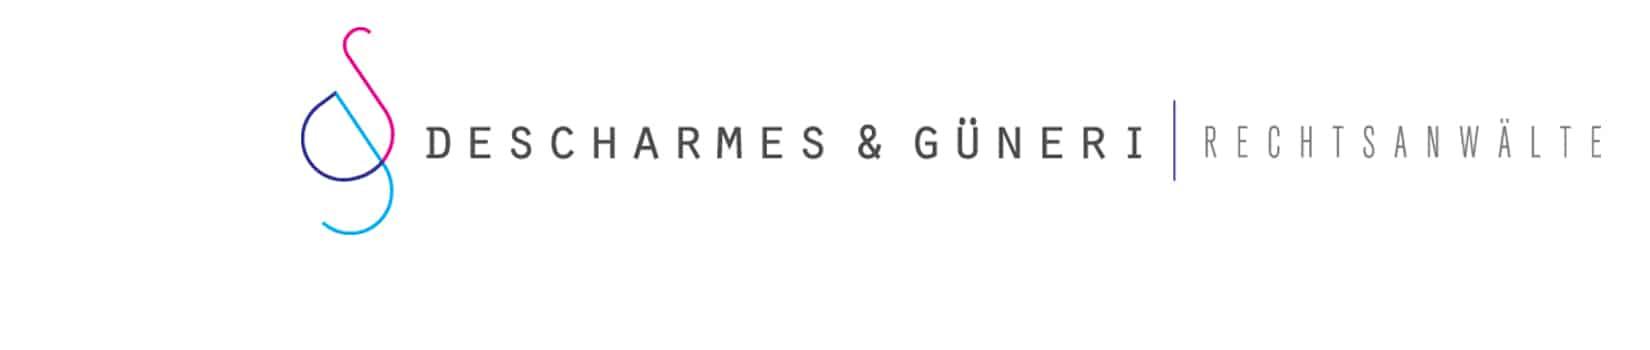 Descharmes & Güneri Rechtsanwälte (dg_advizzr)